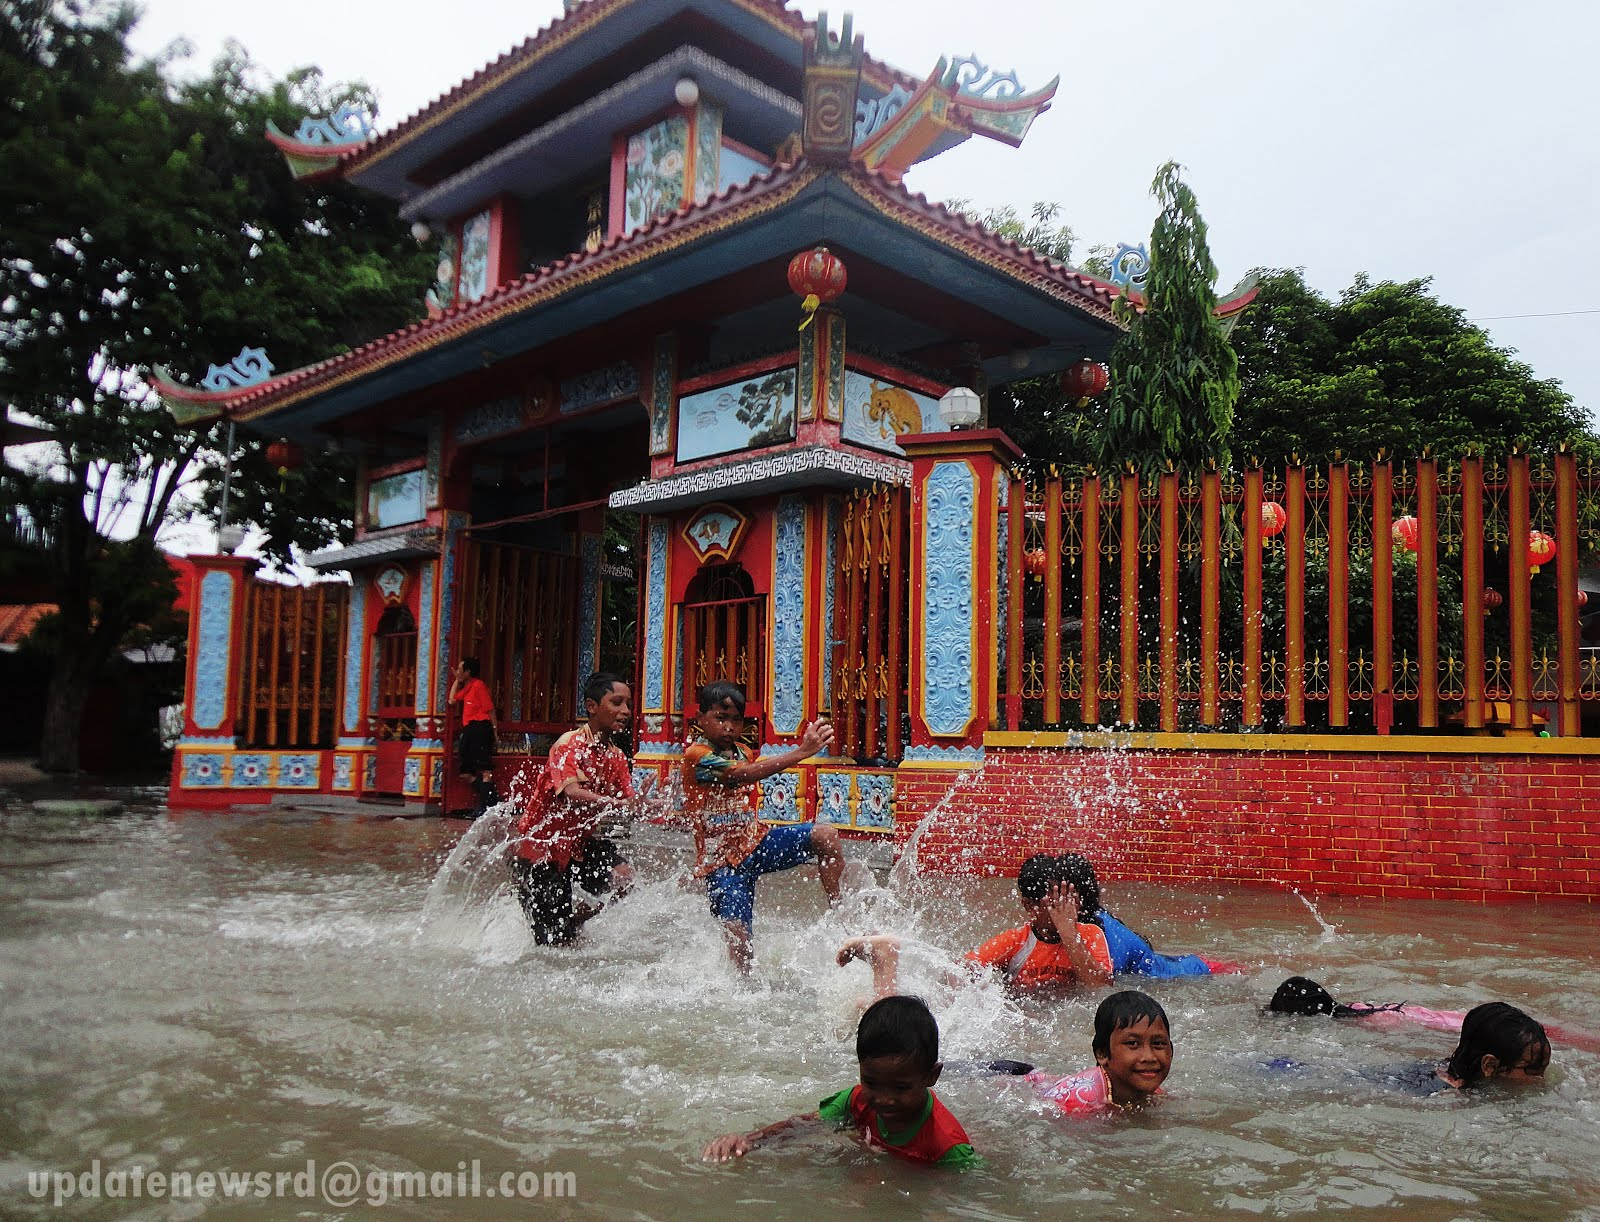 Banjir mewarnai perayaan Imlek di Klenteng Tjong Hok Kiong di Jalan Hang Tuah Sidoarjo Sejumlah anak bermain air di depannya Foto Wawan